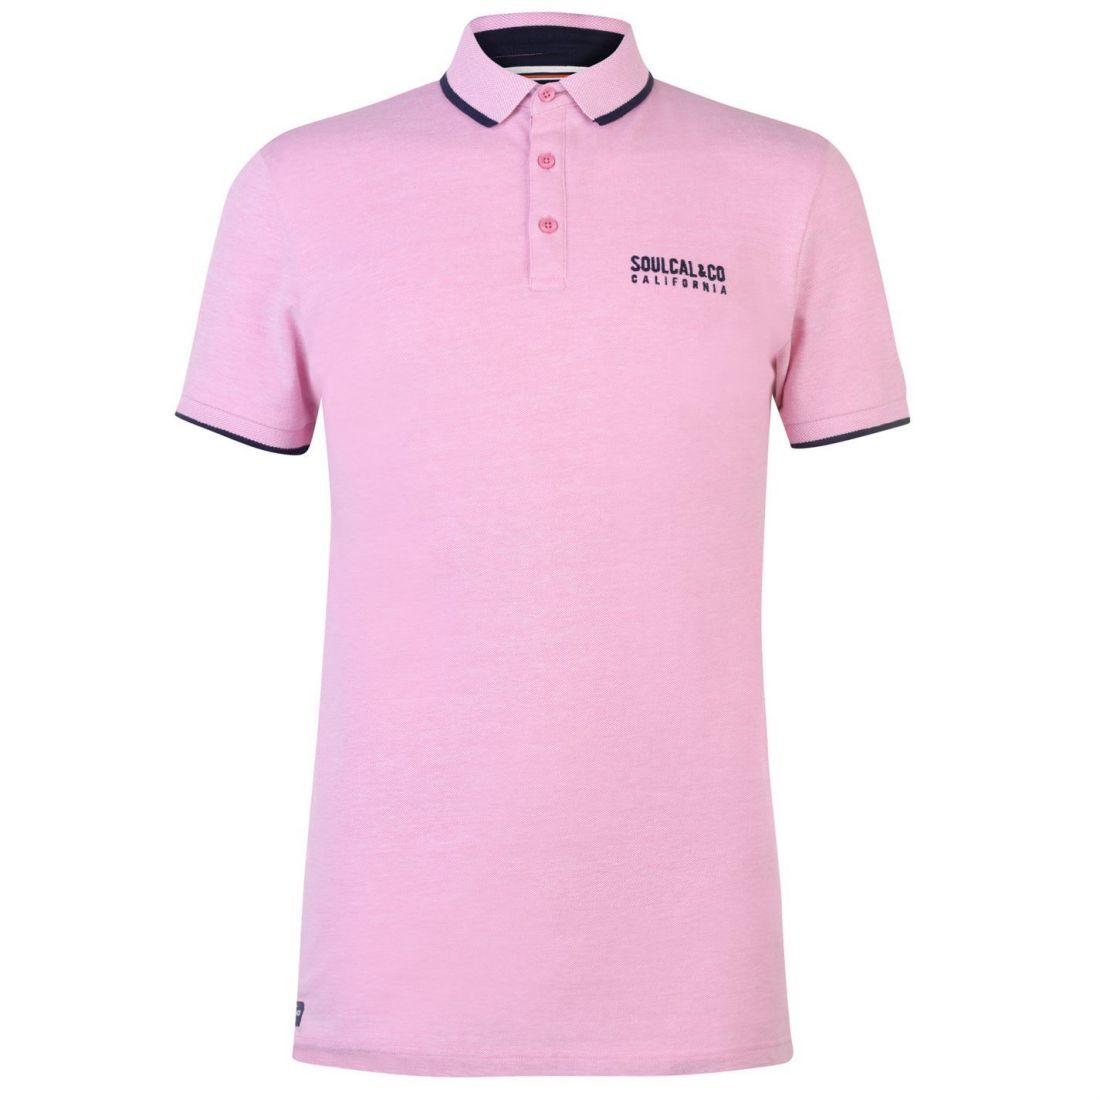 c026b5d1a SoulCal Mens Pique Polo Shirt Classic Fit Tee Top Short Sleeve ...